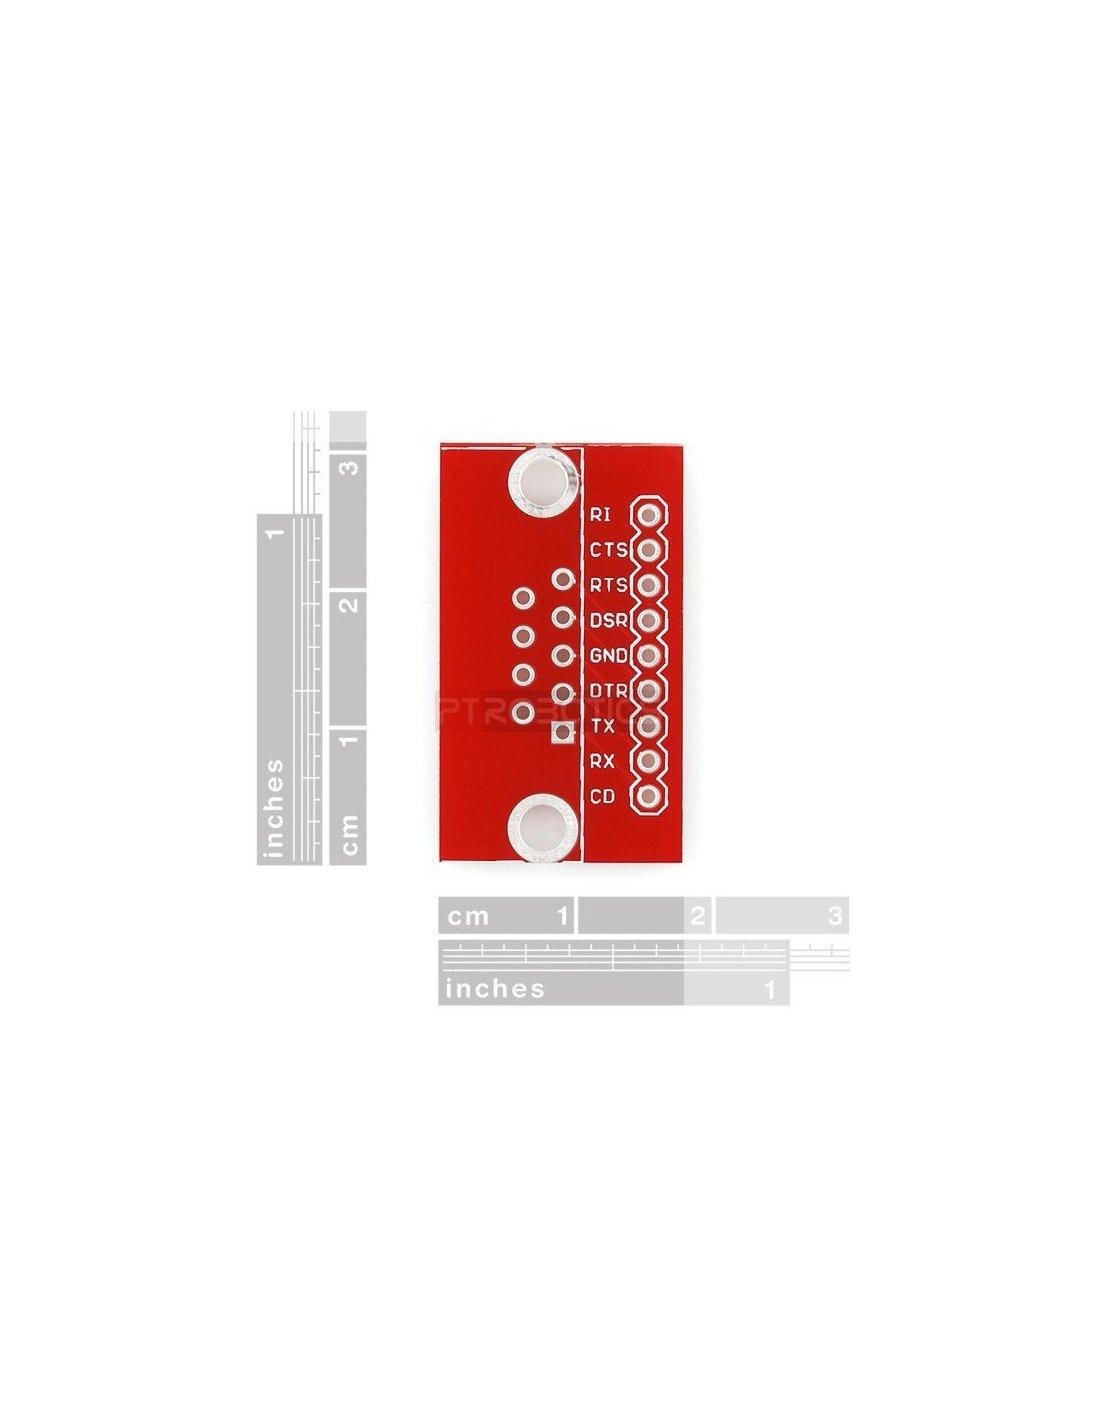 db9 Mouser Electronics, Inc